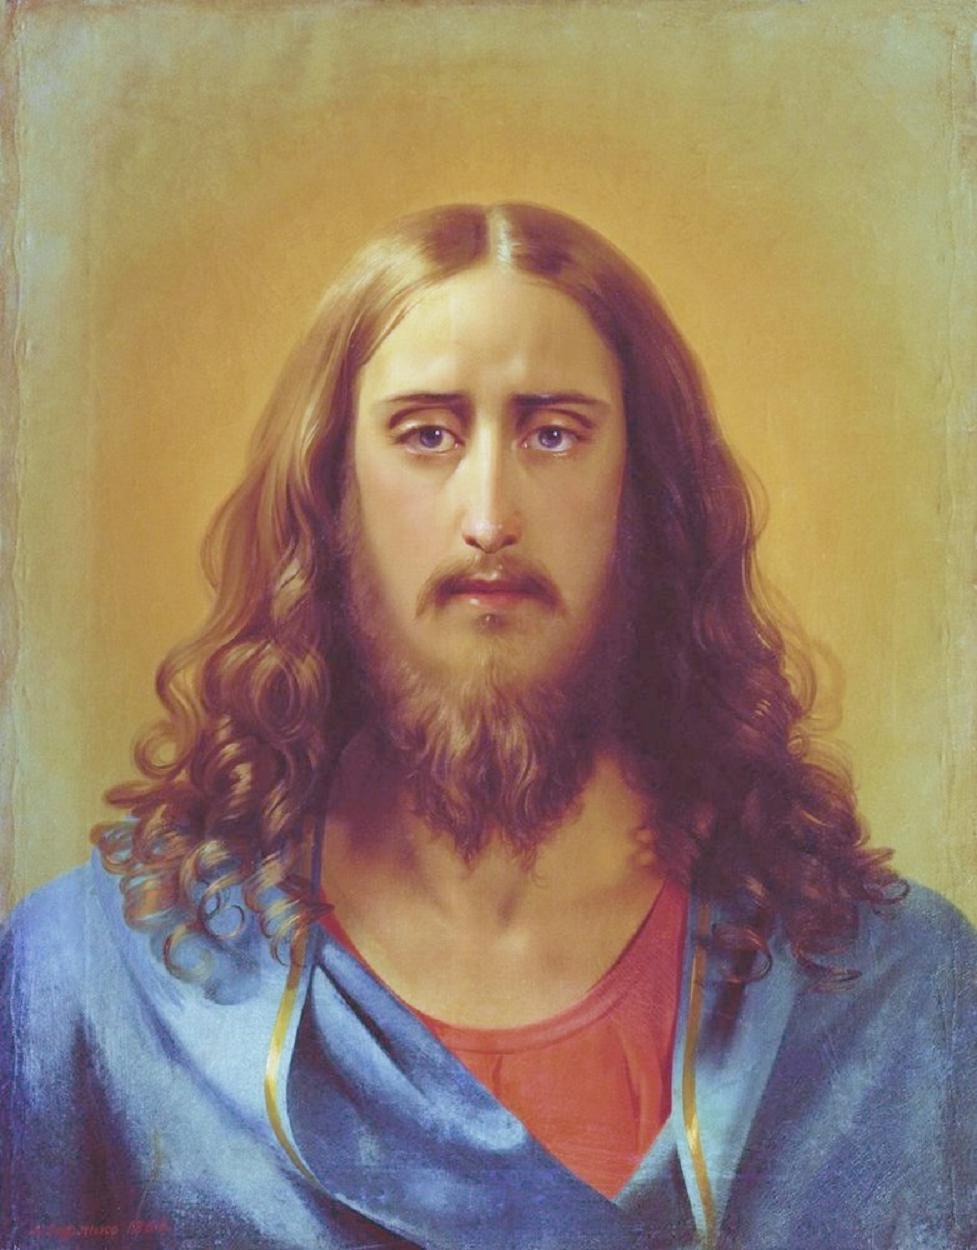 hadits rasul tentang dajjal